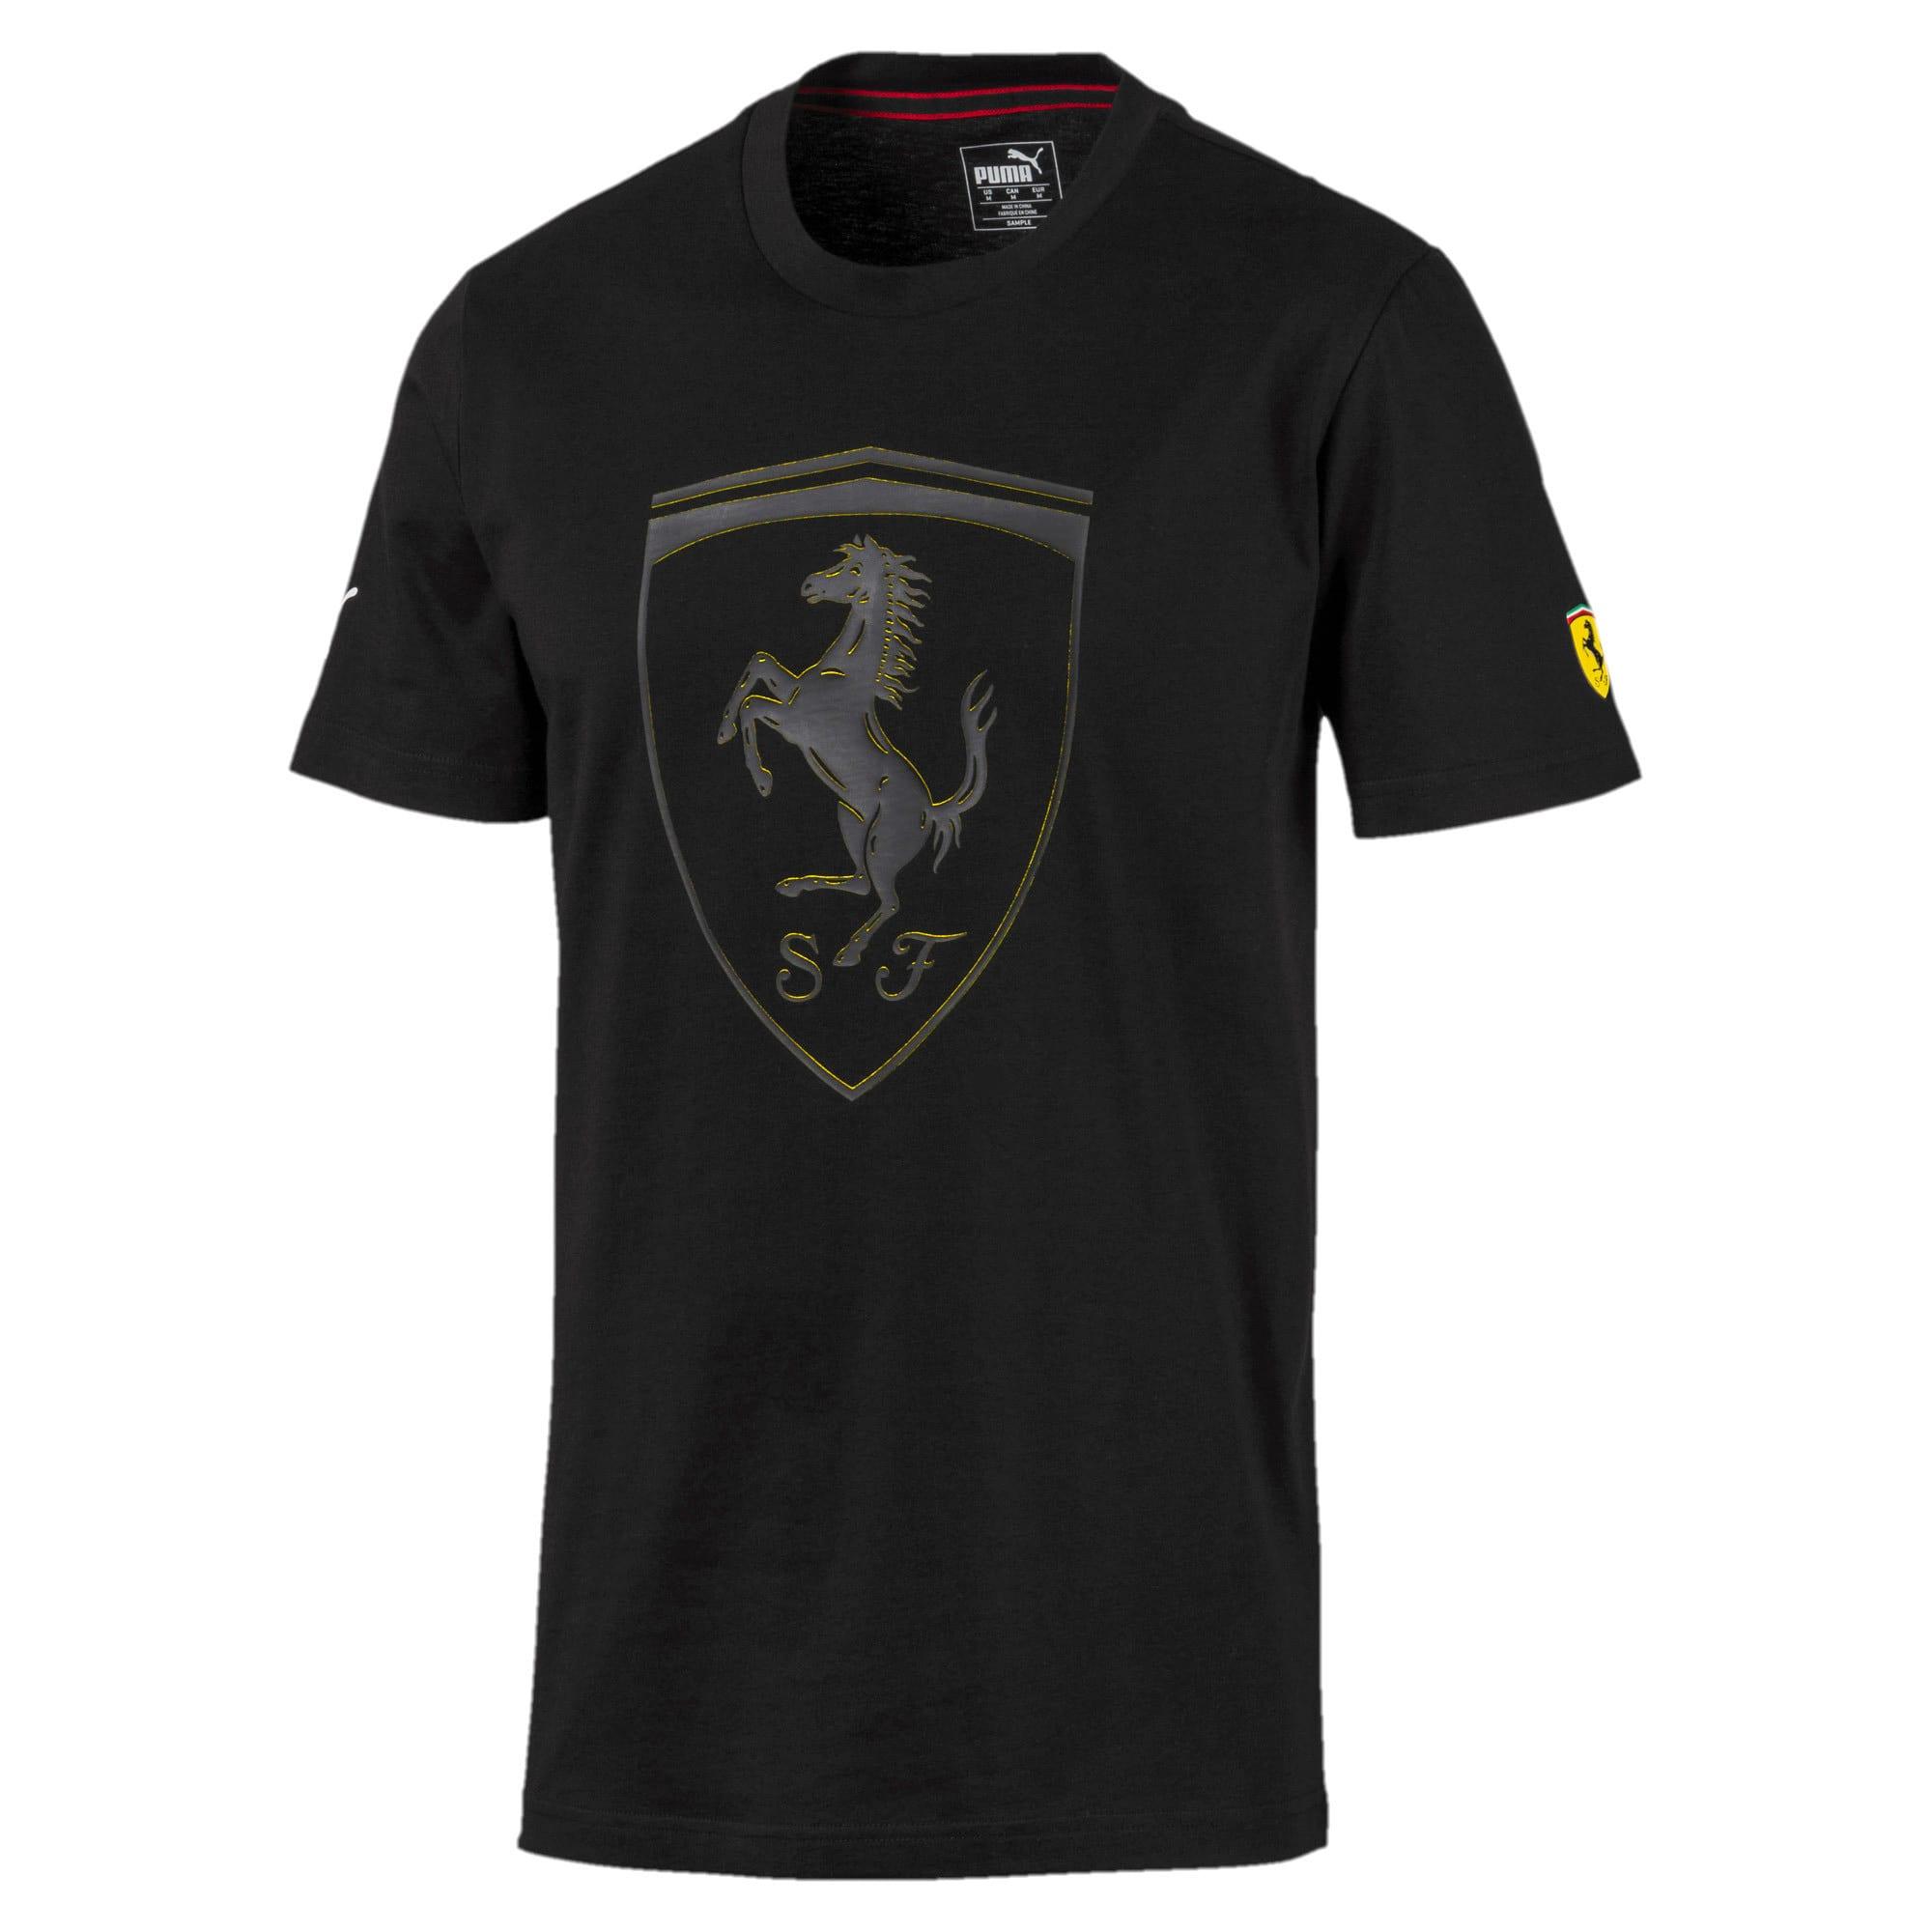 Thumbnail 4 of T-shirt Ferrari Big Shield uomo, Puma Black, medium